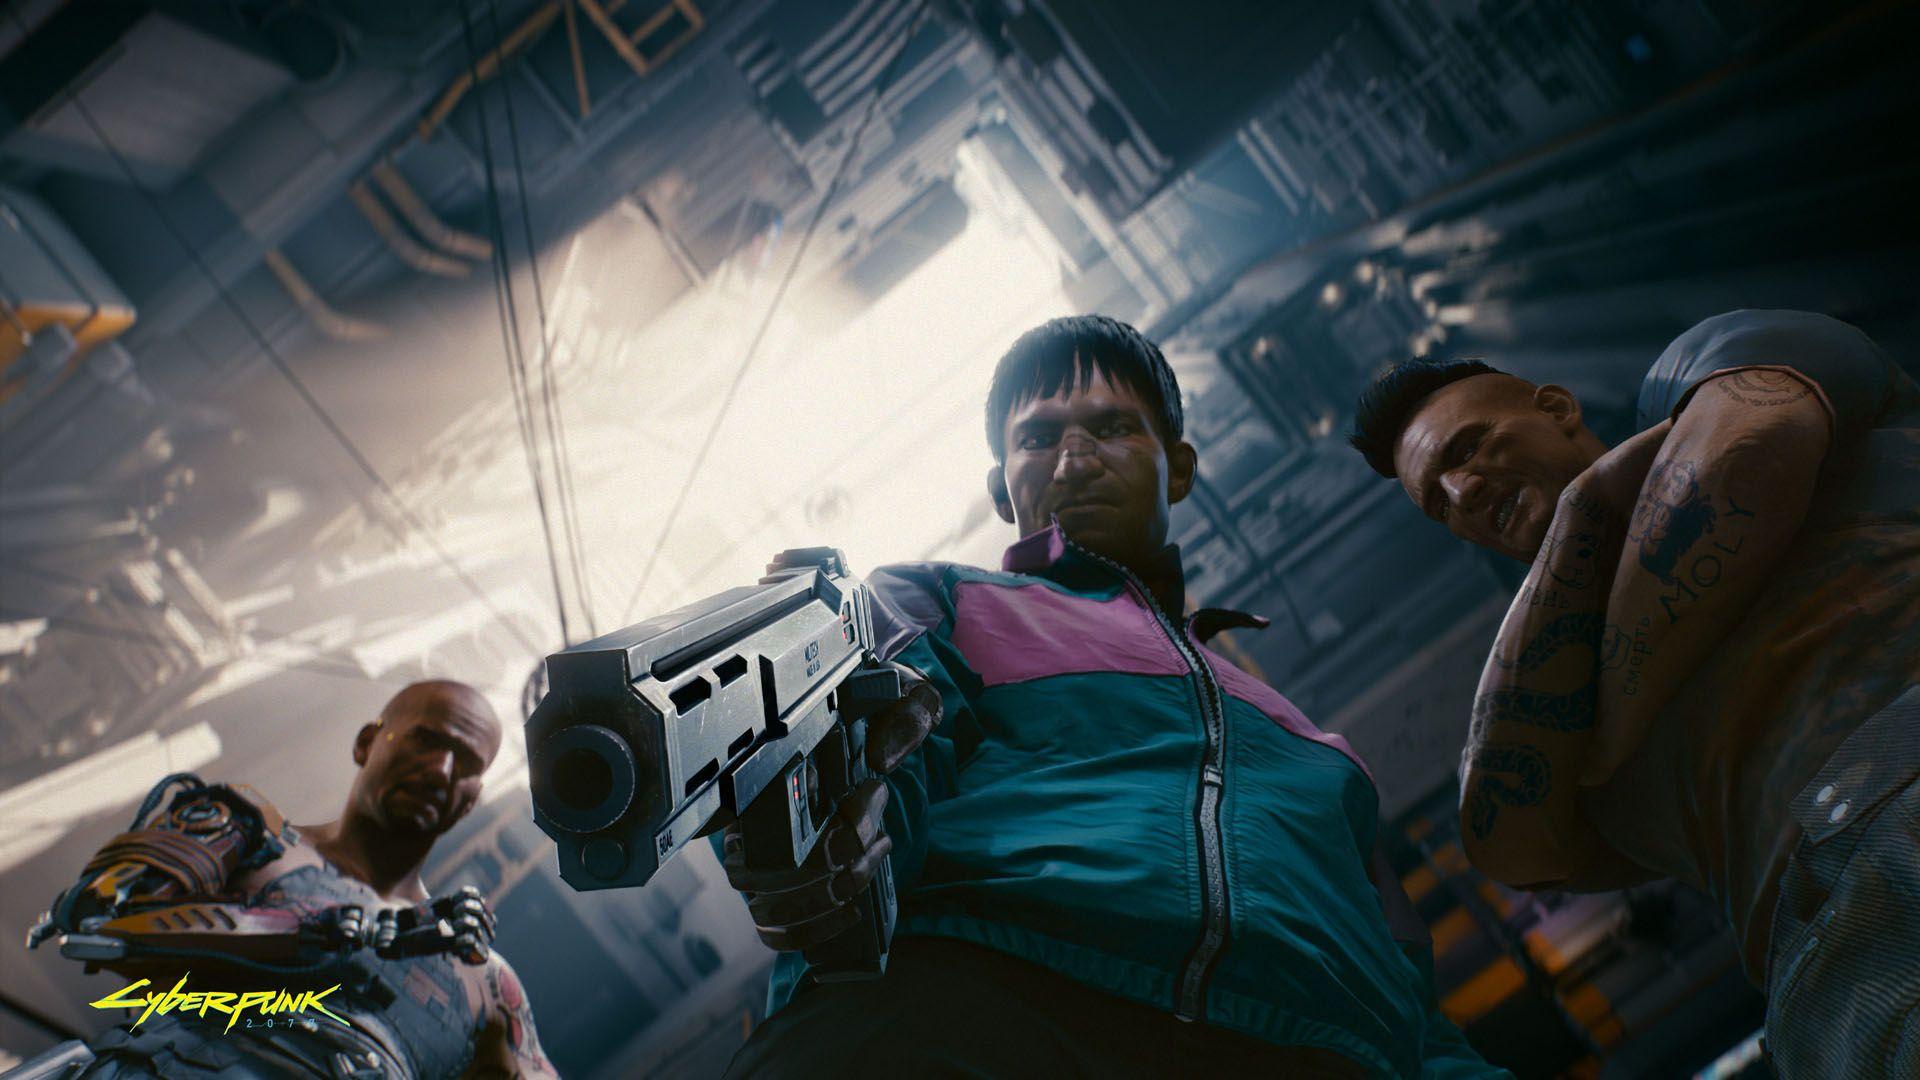 cyberpunk-2077-release-date-leak